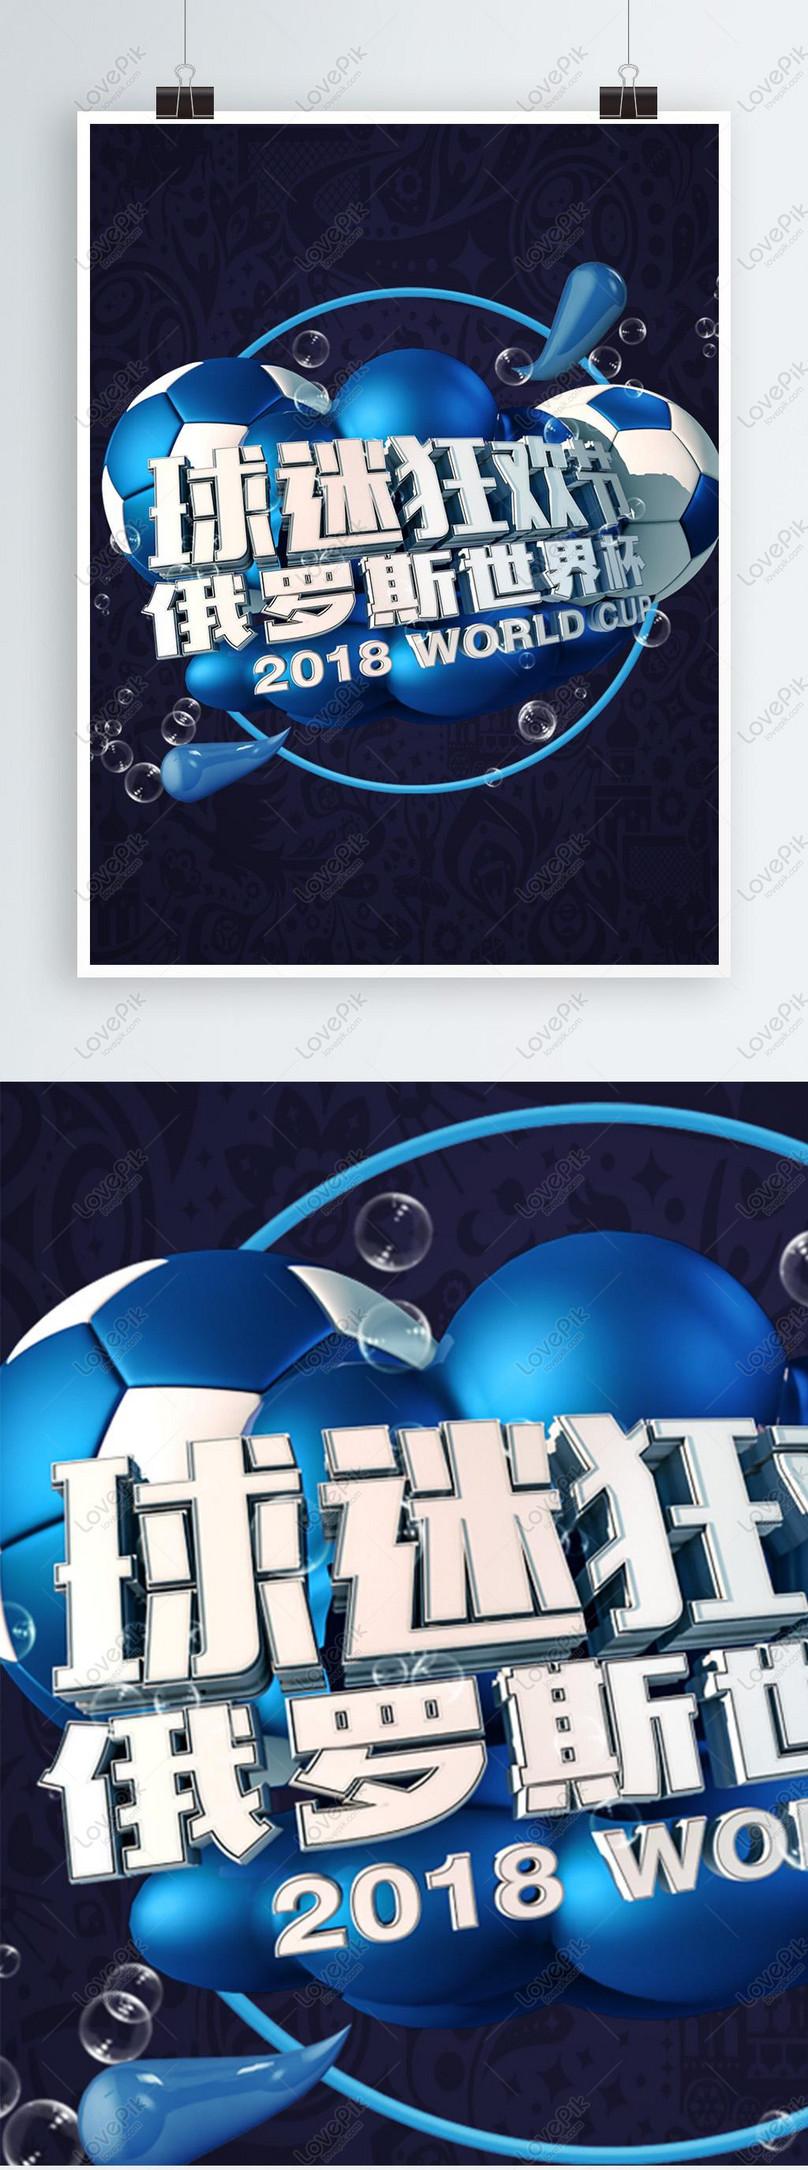 World cup russian art word blue 3d texture graphics